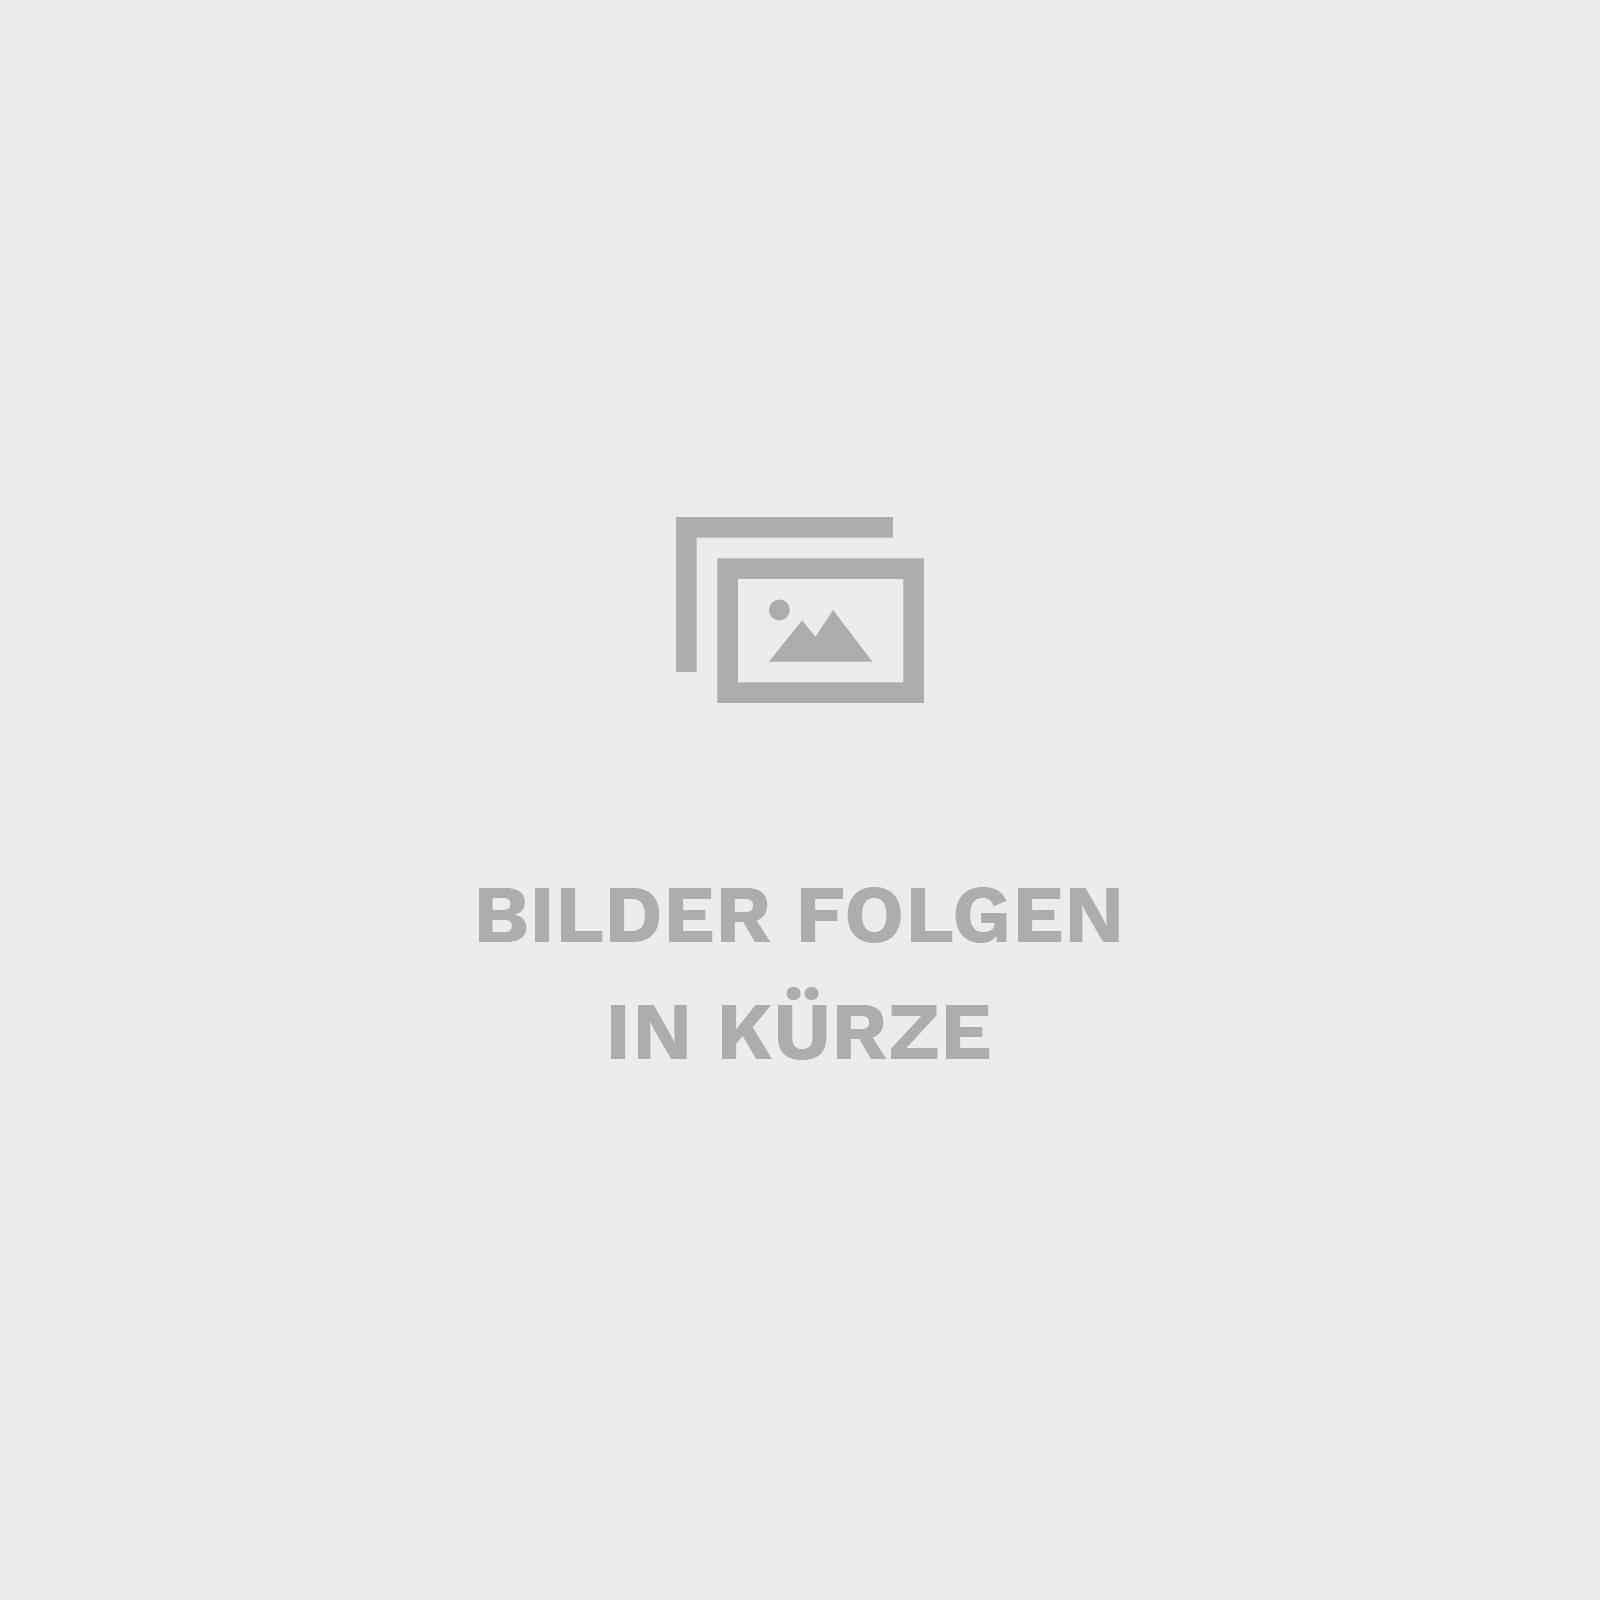 Kvadrat Rugs - Duotone - Farbe 0621 - Detailansicht